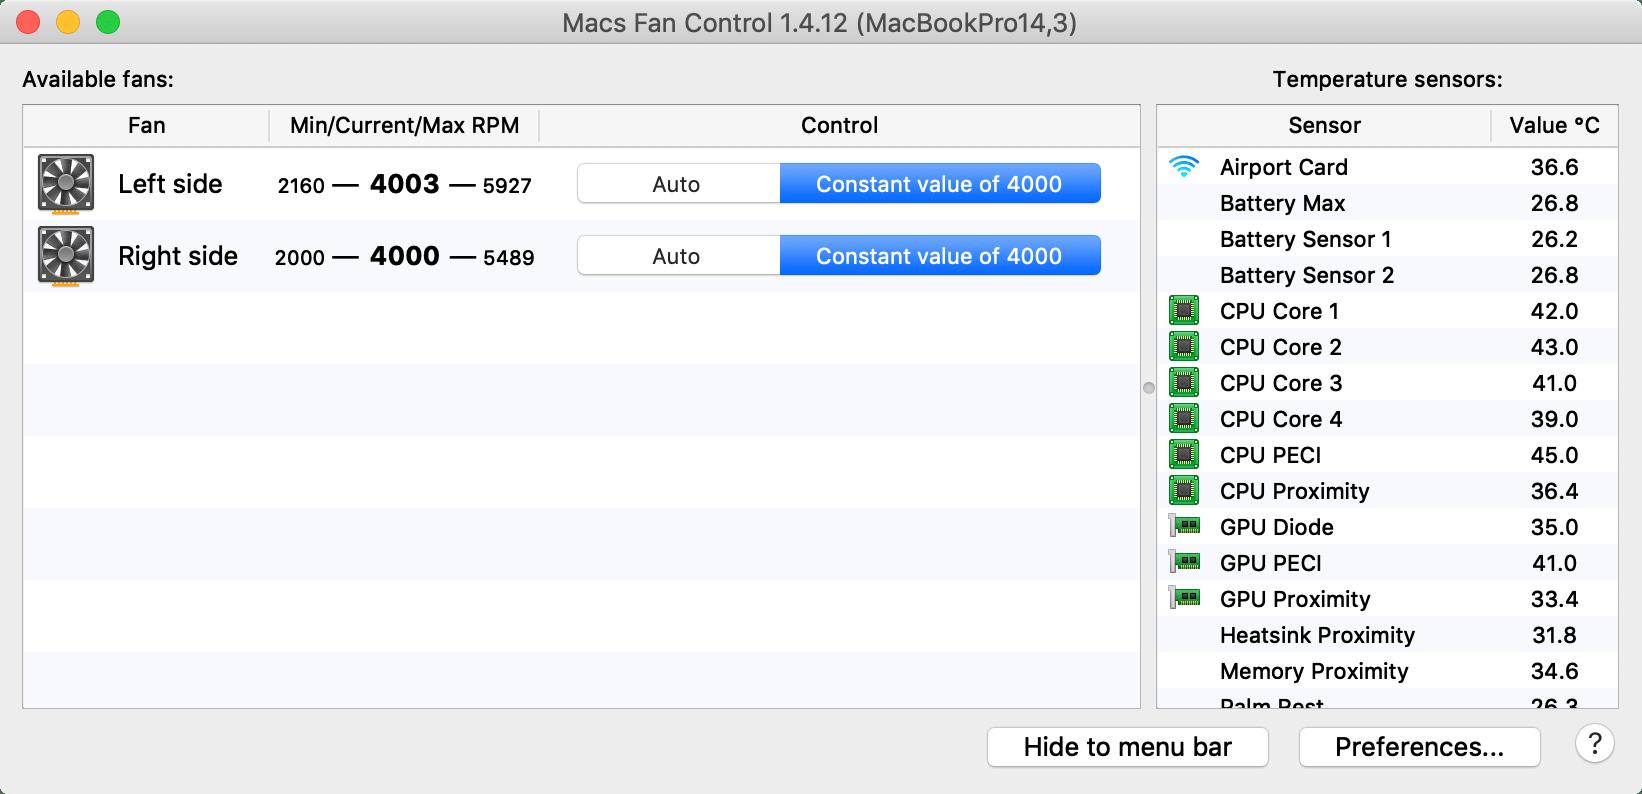 Manually set your Mac's cooling fan speeds with Macs Fan